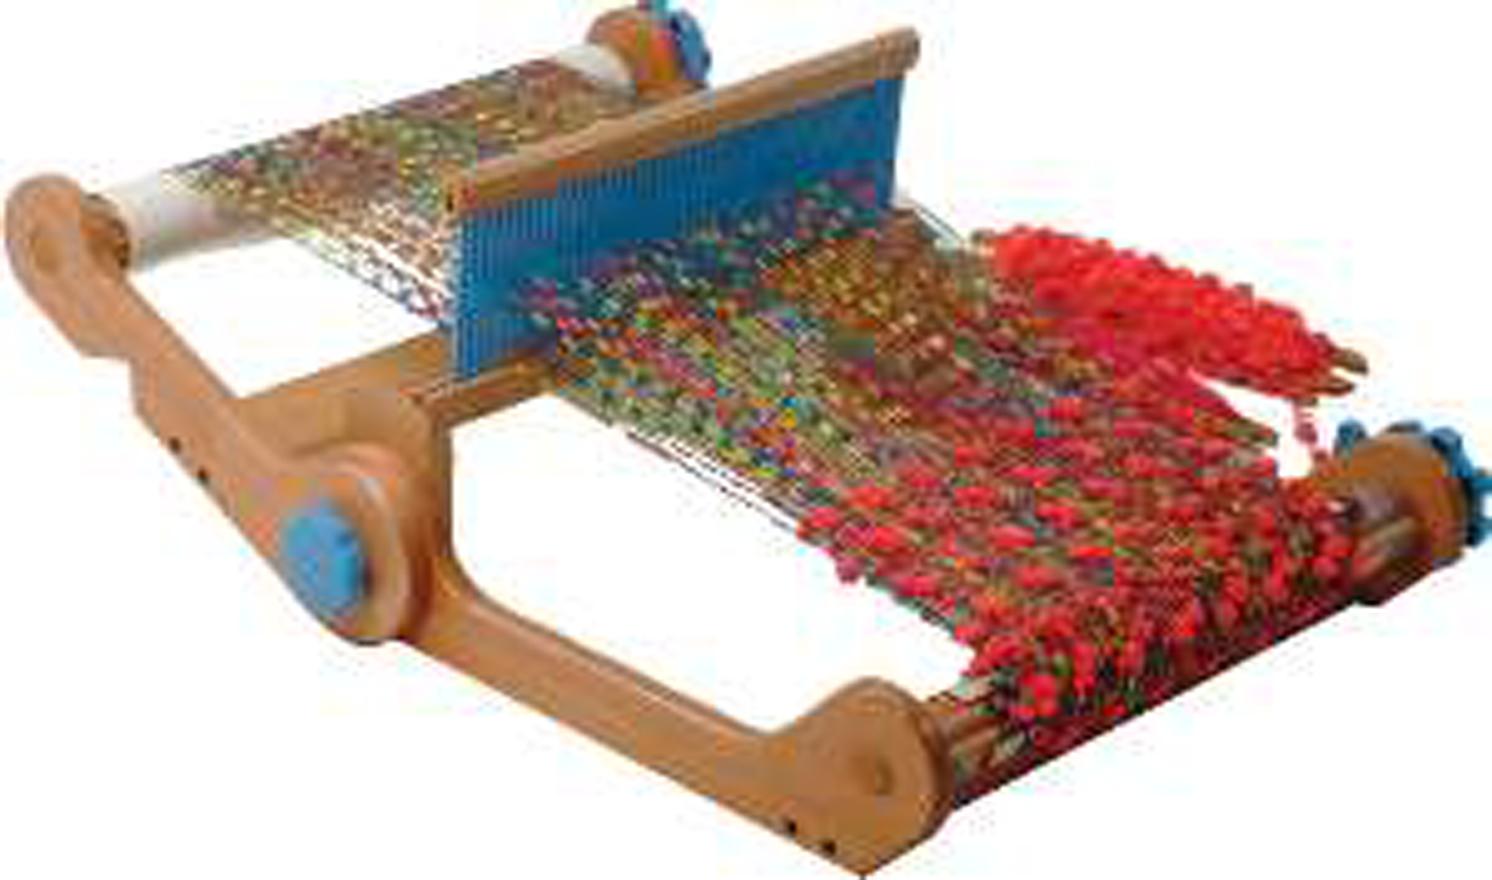 ashford-knitters-loom-copy